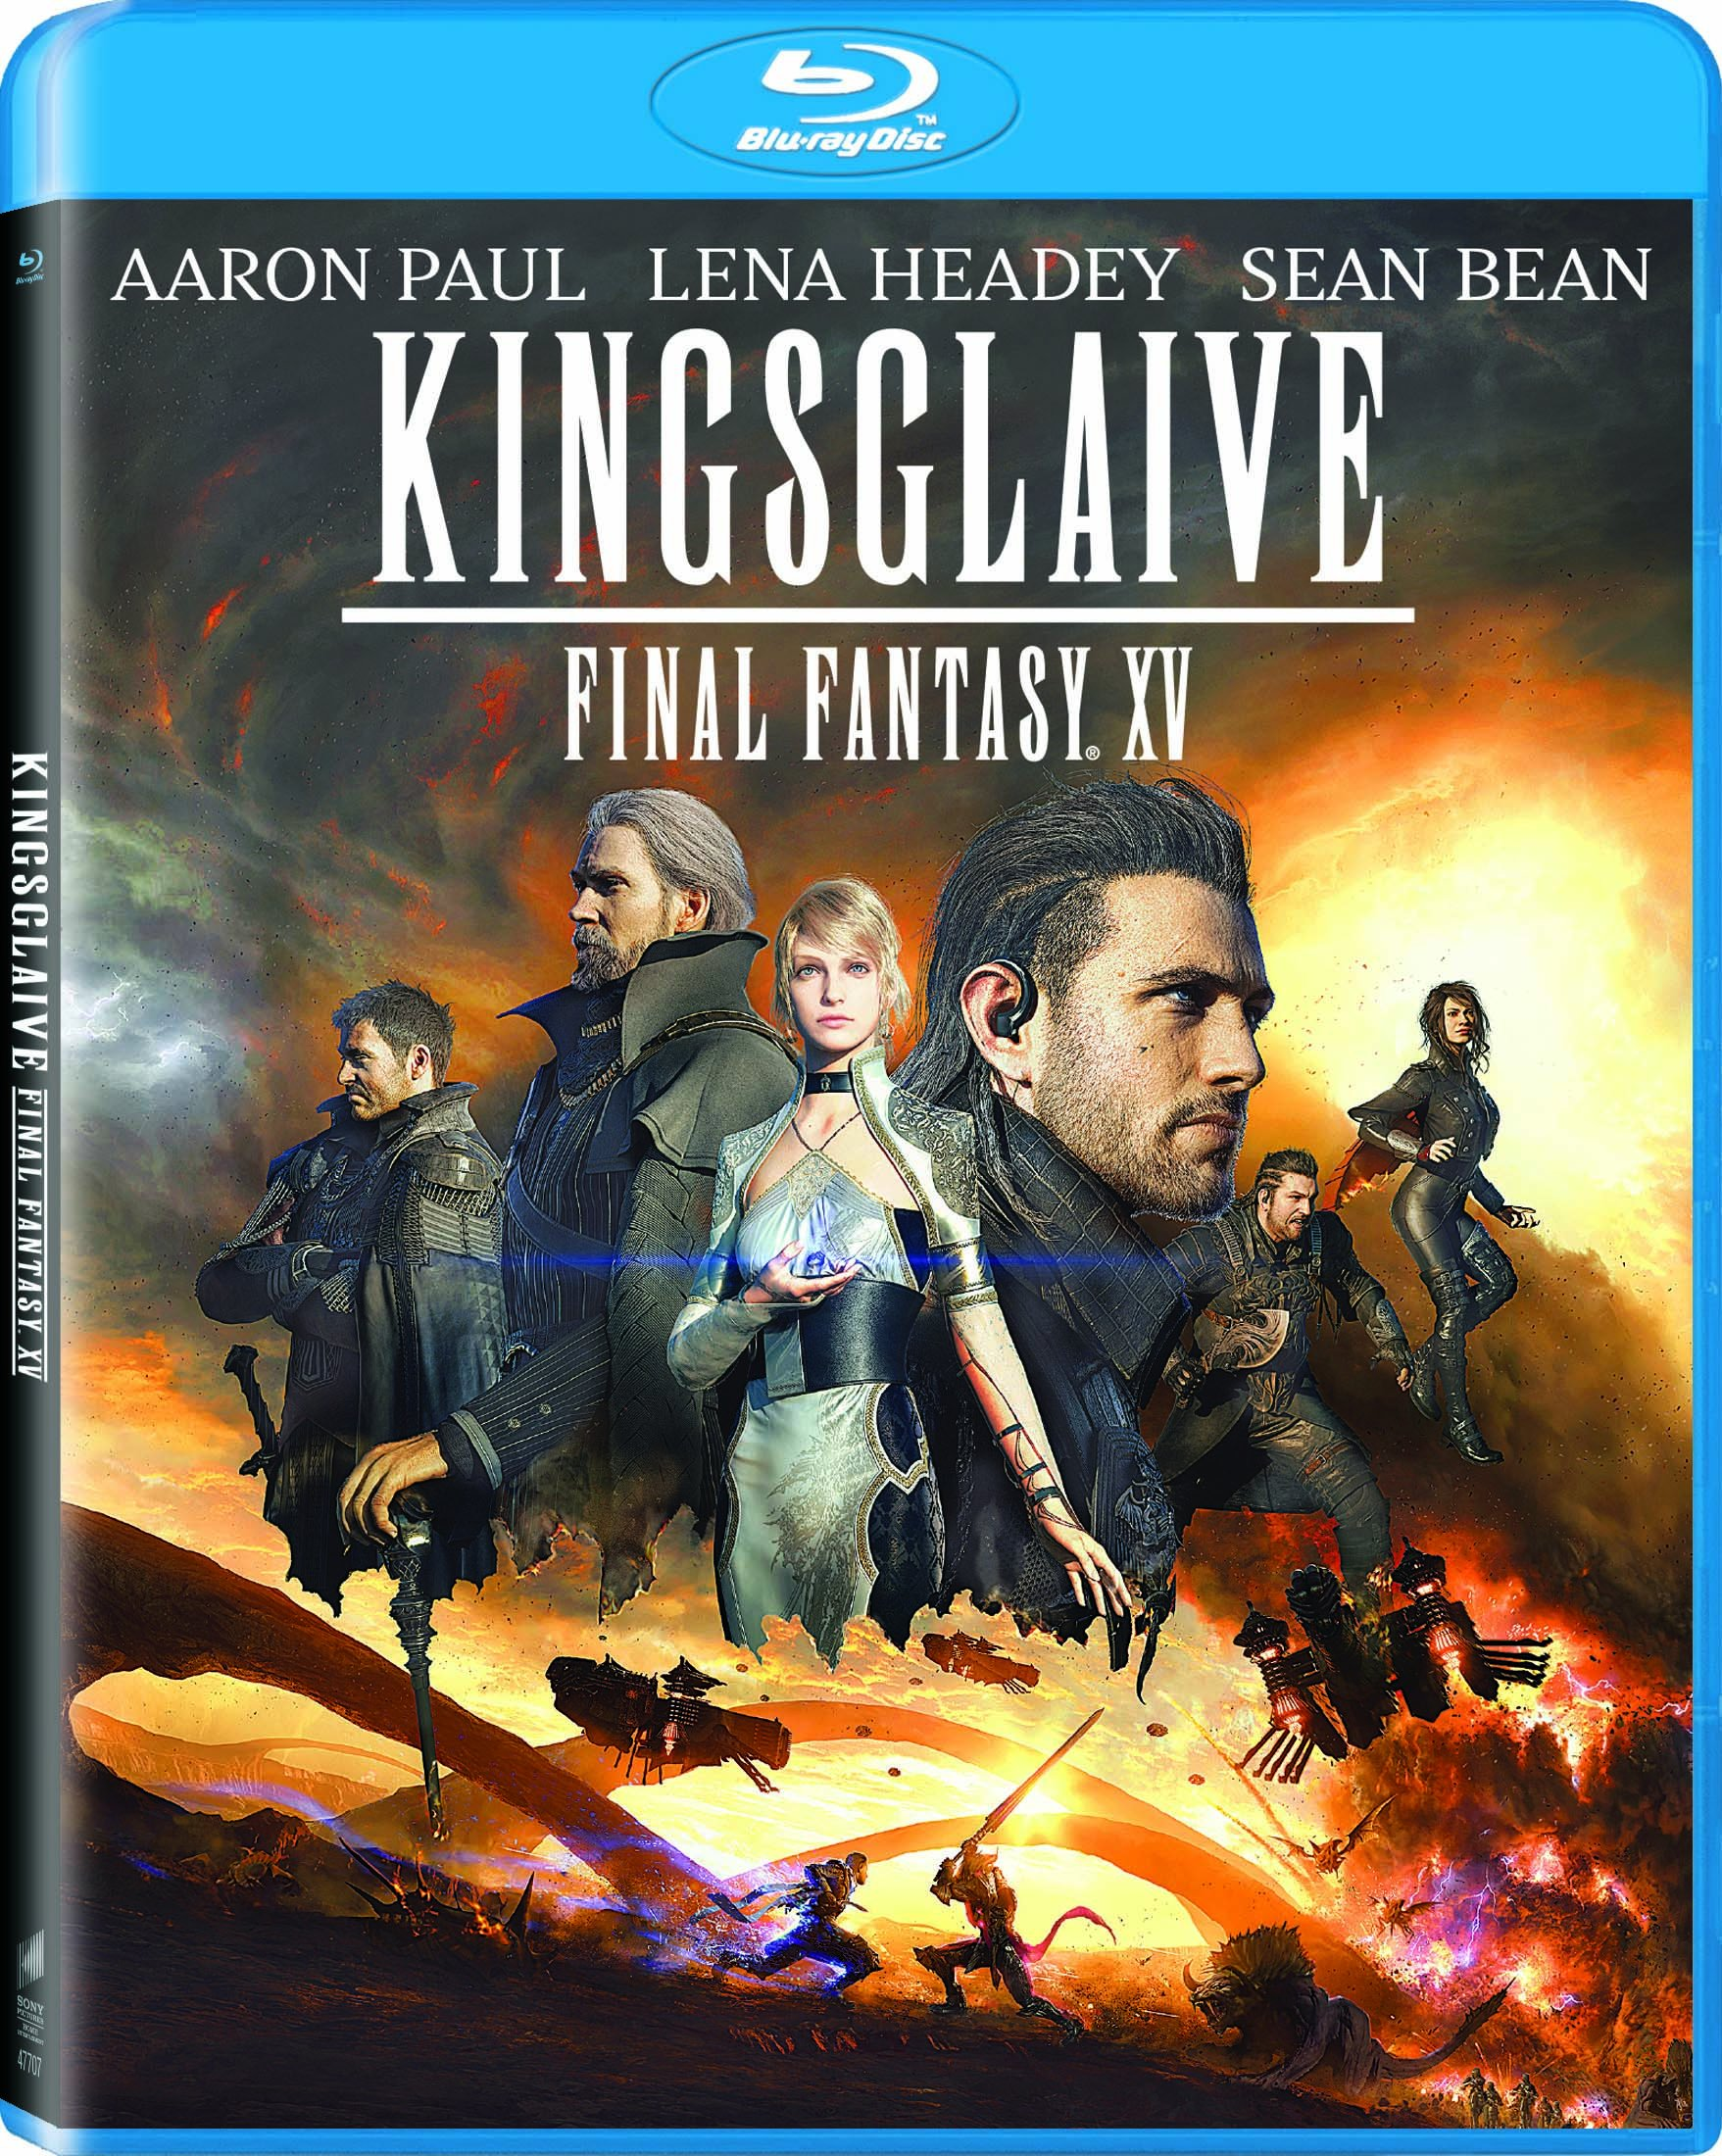 Blu-ray : Final Fantasy XV: Kingsglaive (Blu-ray)